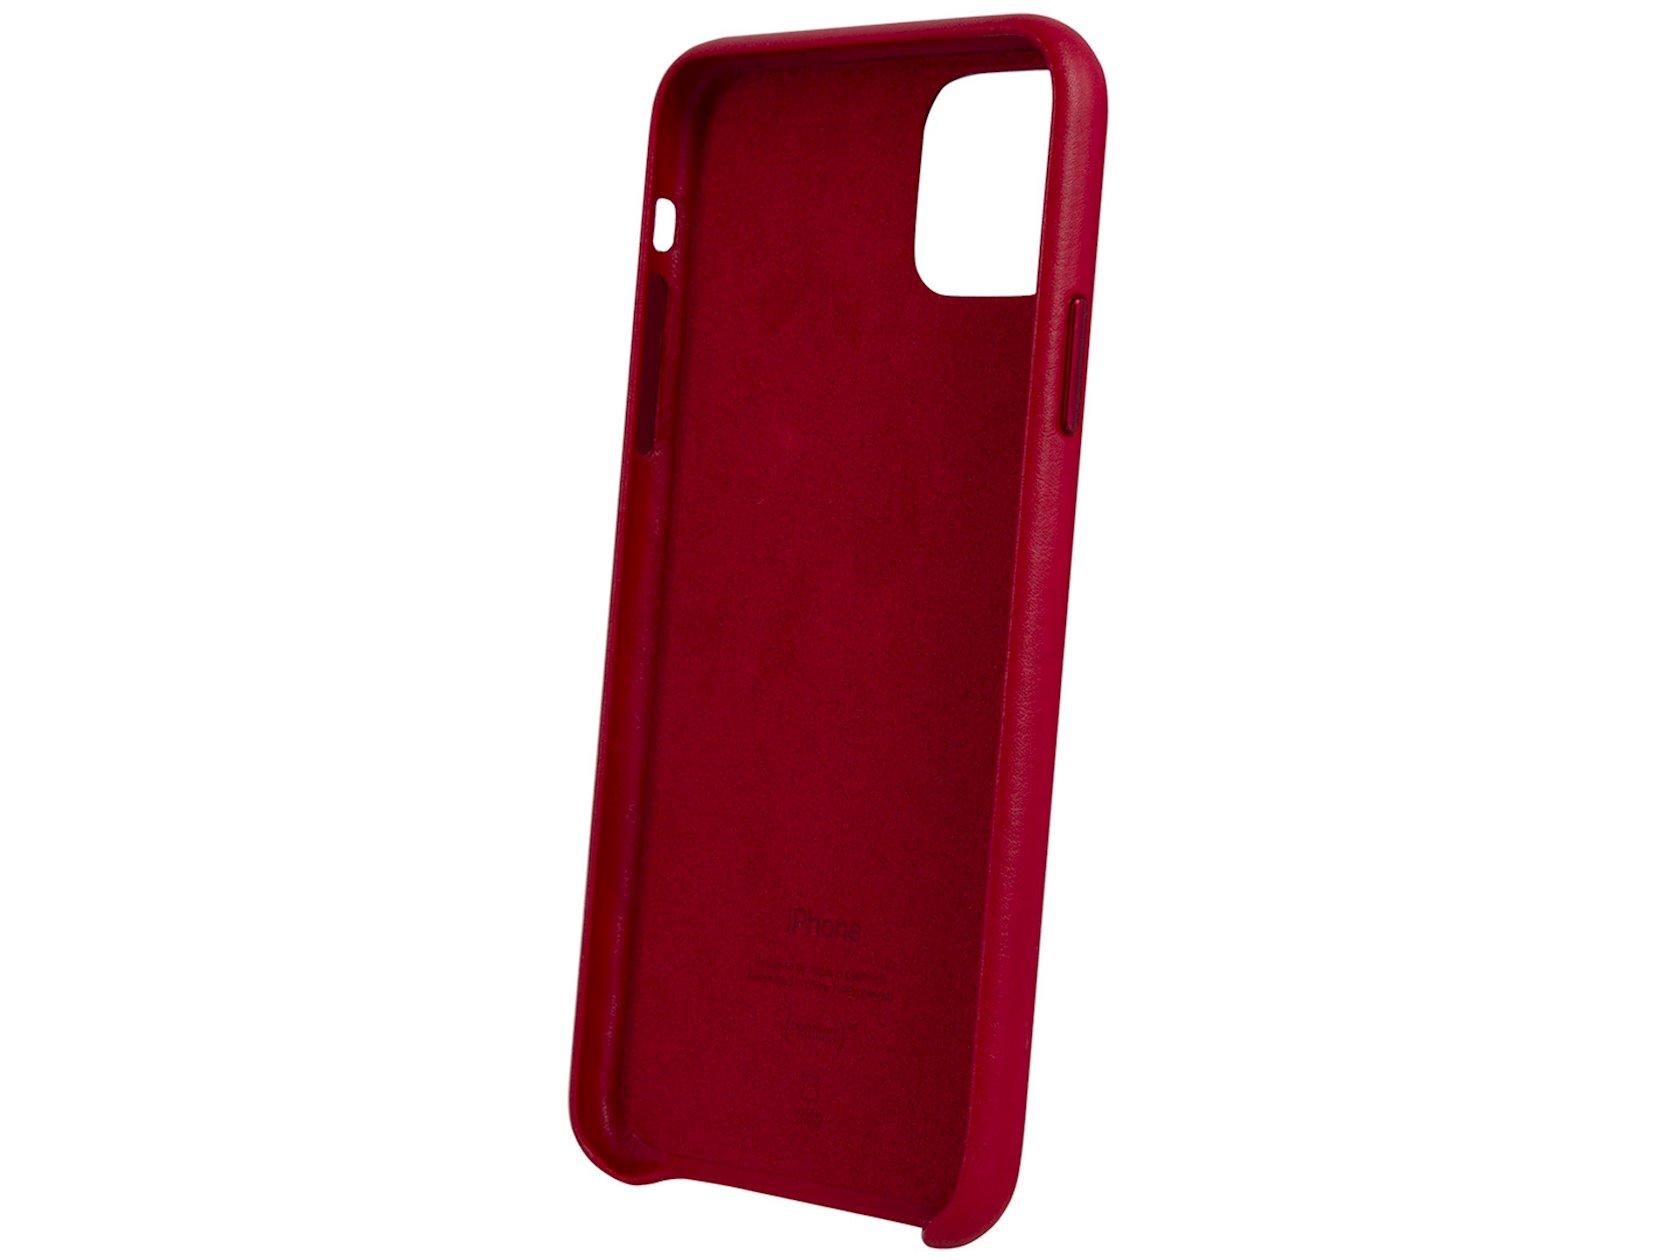 Çexol Leather Case Apple iPhone 11 Pro Max üçün Red